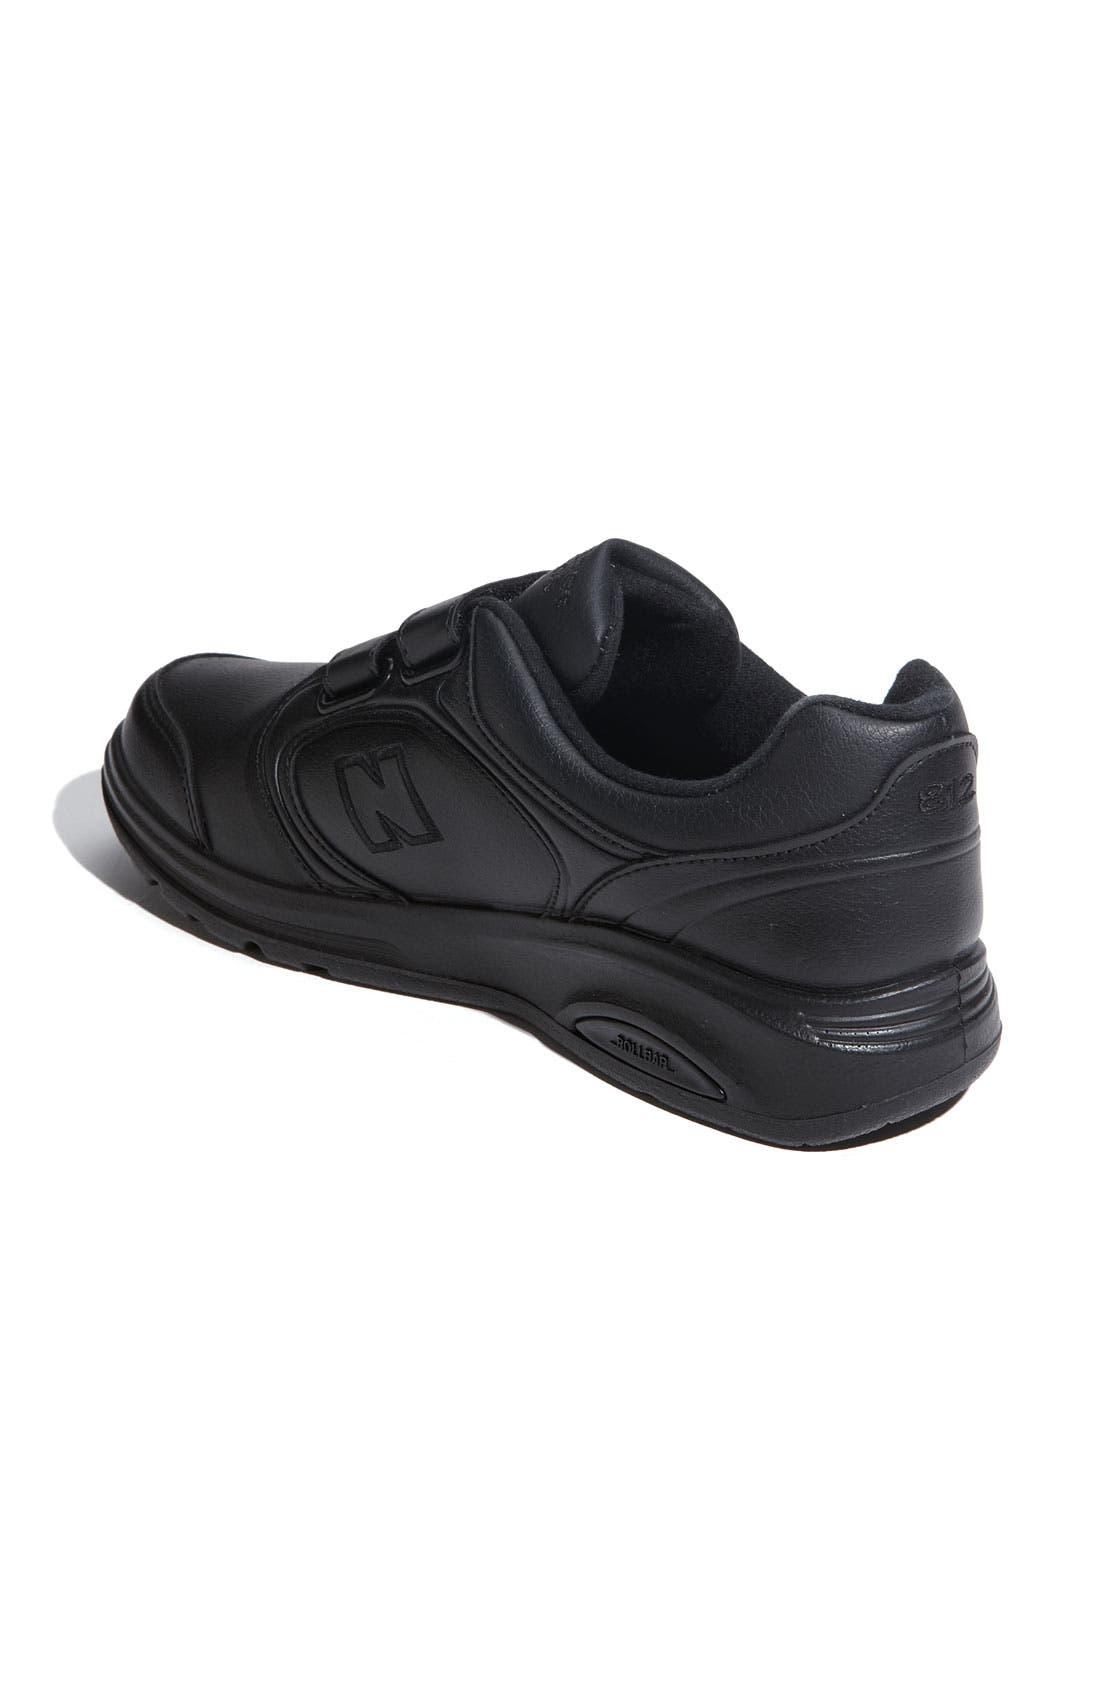 Alternate Image 2  - New Balance '812' Walking Shoe (Women)